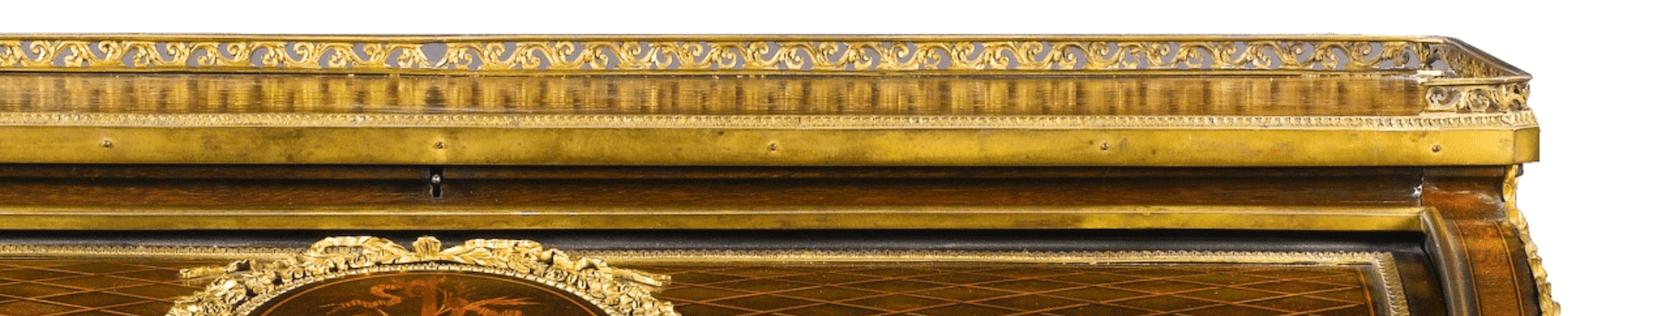 антикварные бюро